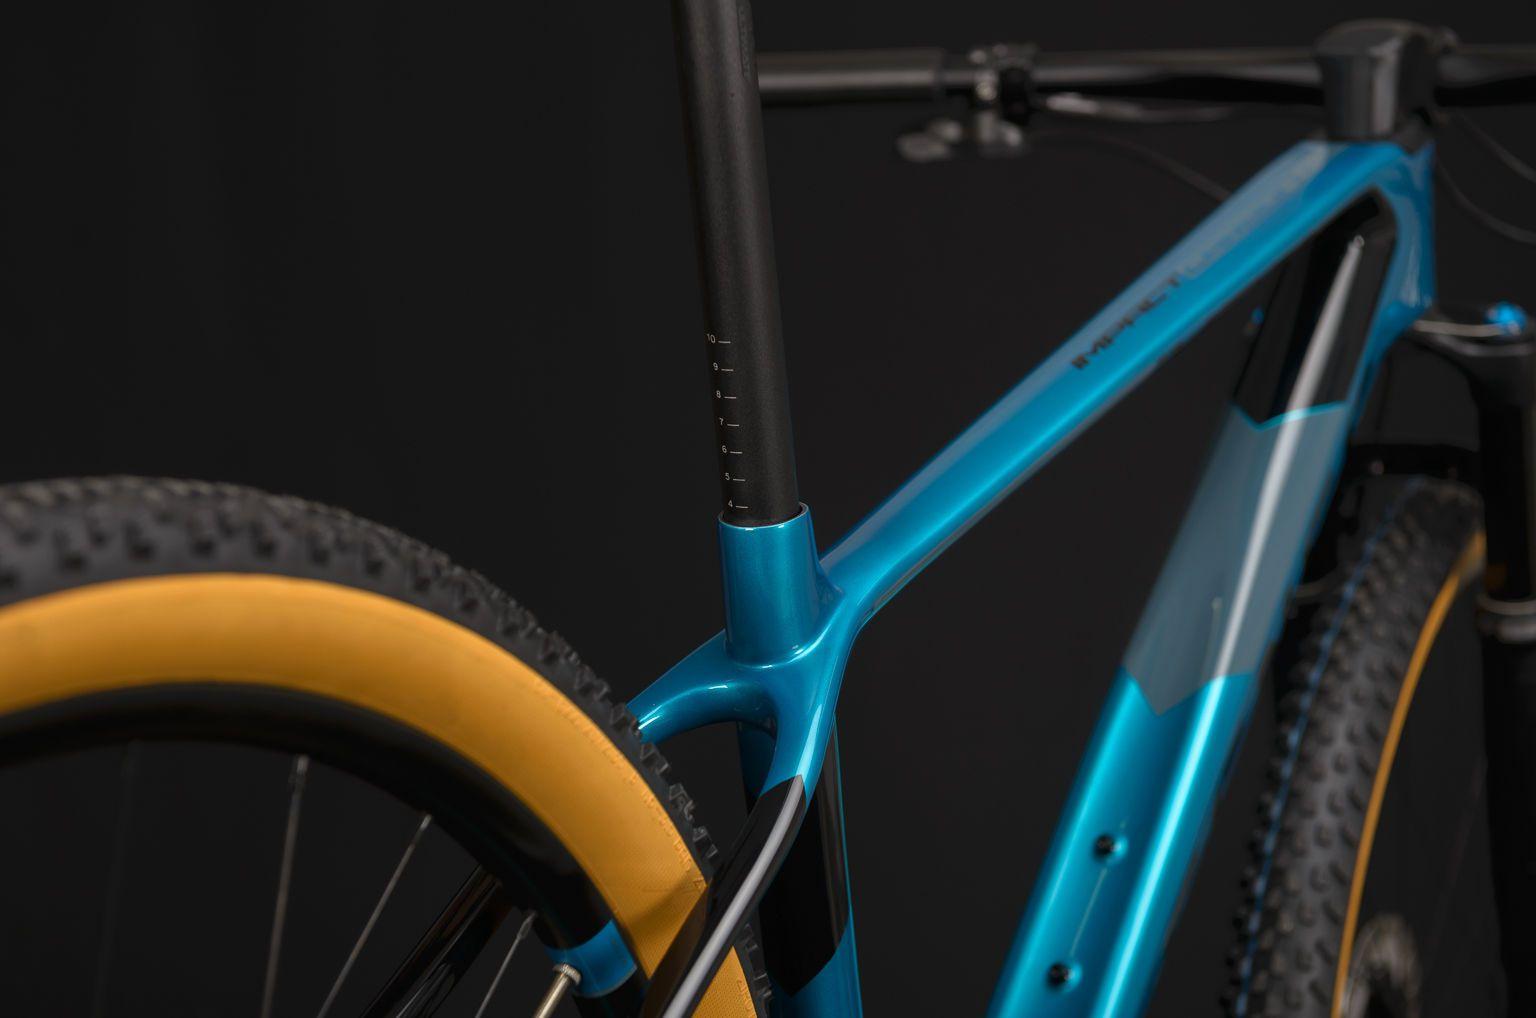 Bicicleta SENSE Impact Carbon Evo 2020 - Preto/Azul